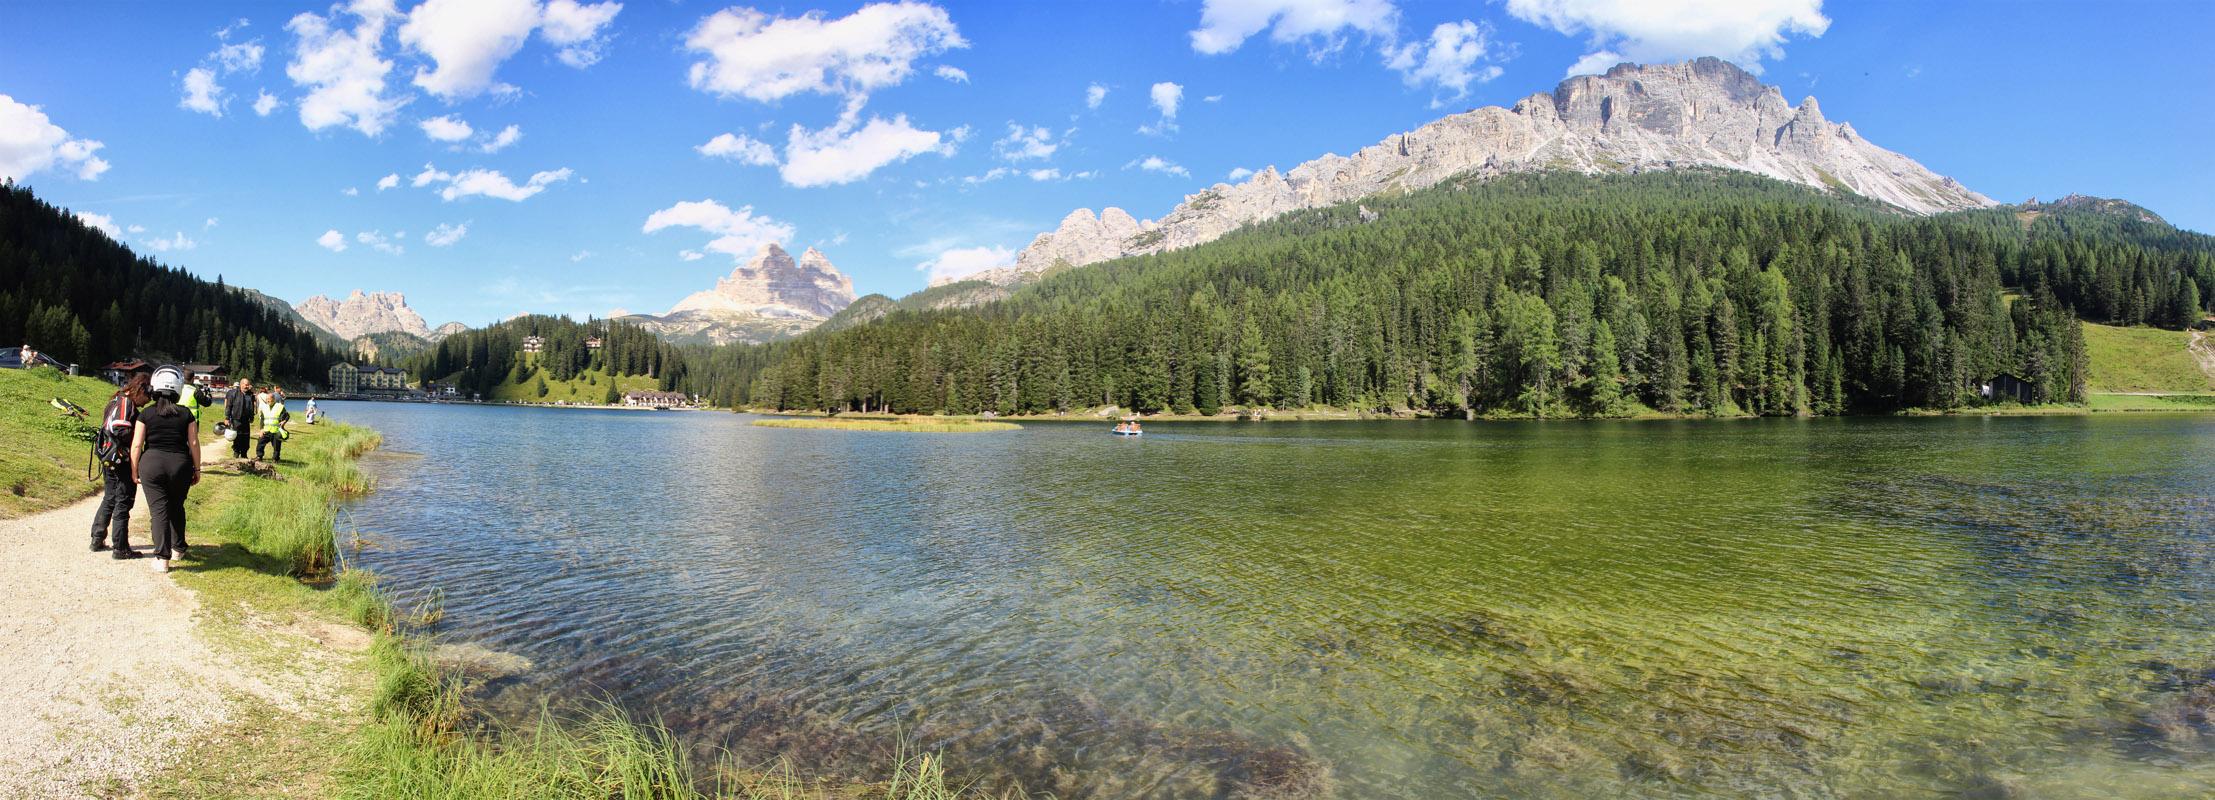 Panoráma Lago di Misurina a Tre Cime